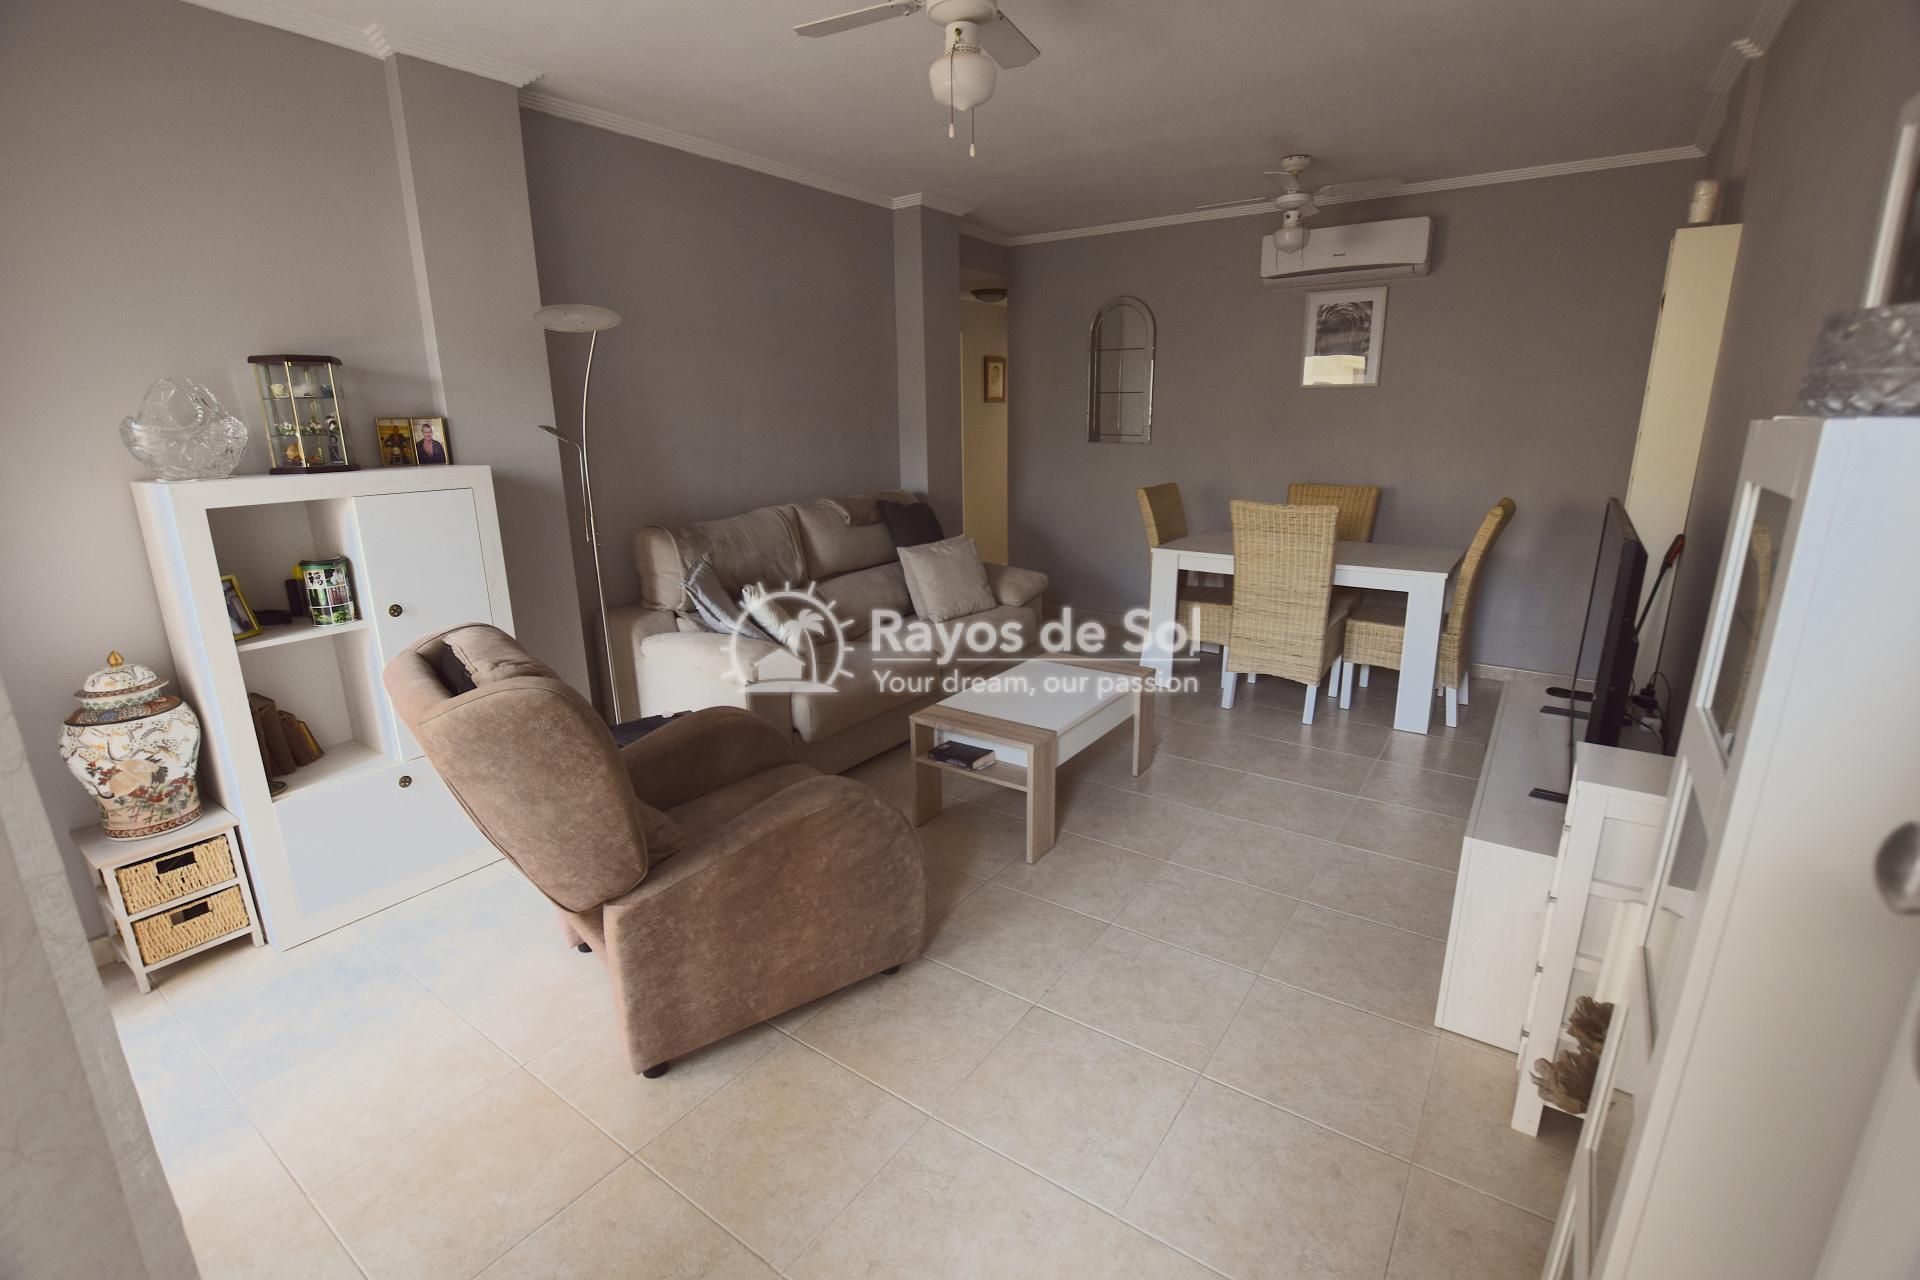 Appartement met zuidwest oriëntatie  in San Cayetano, Costa Cálida (SCRE0055) - 2